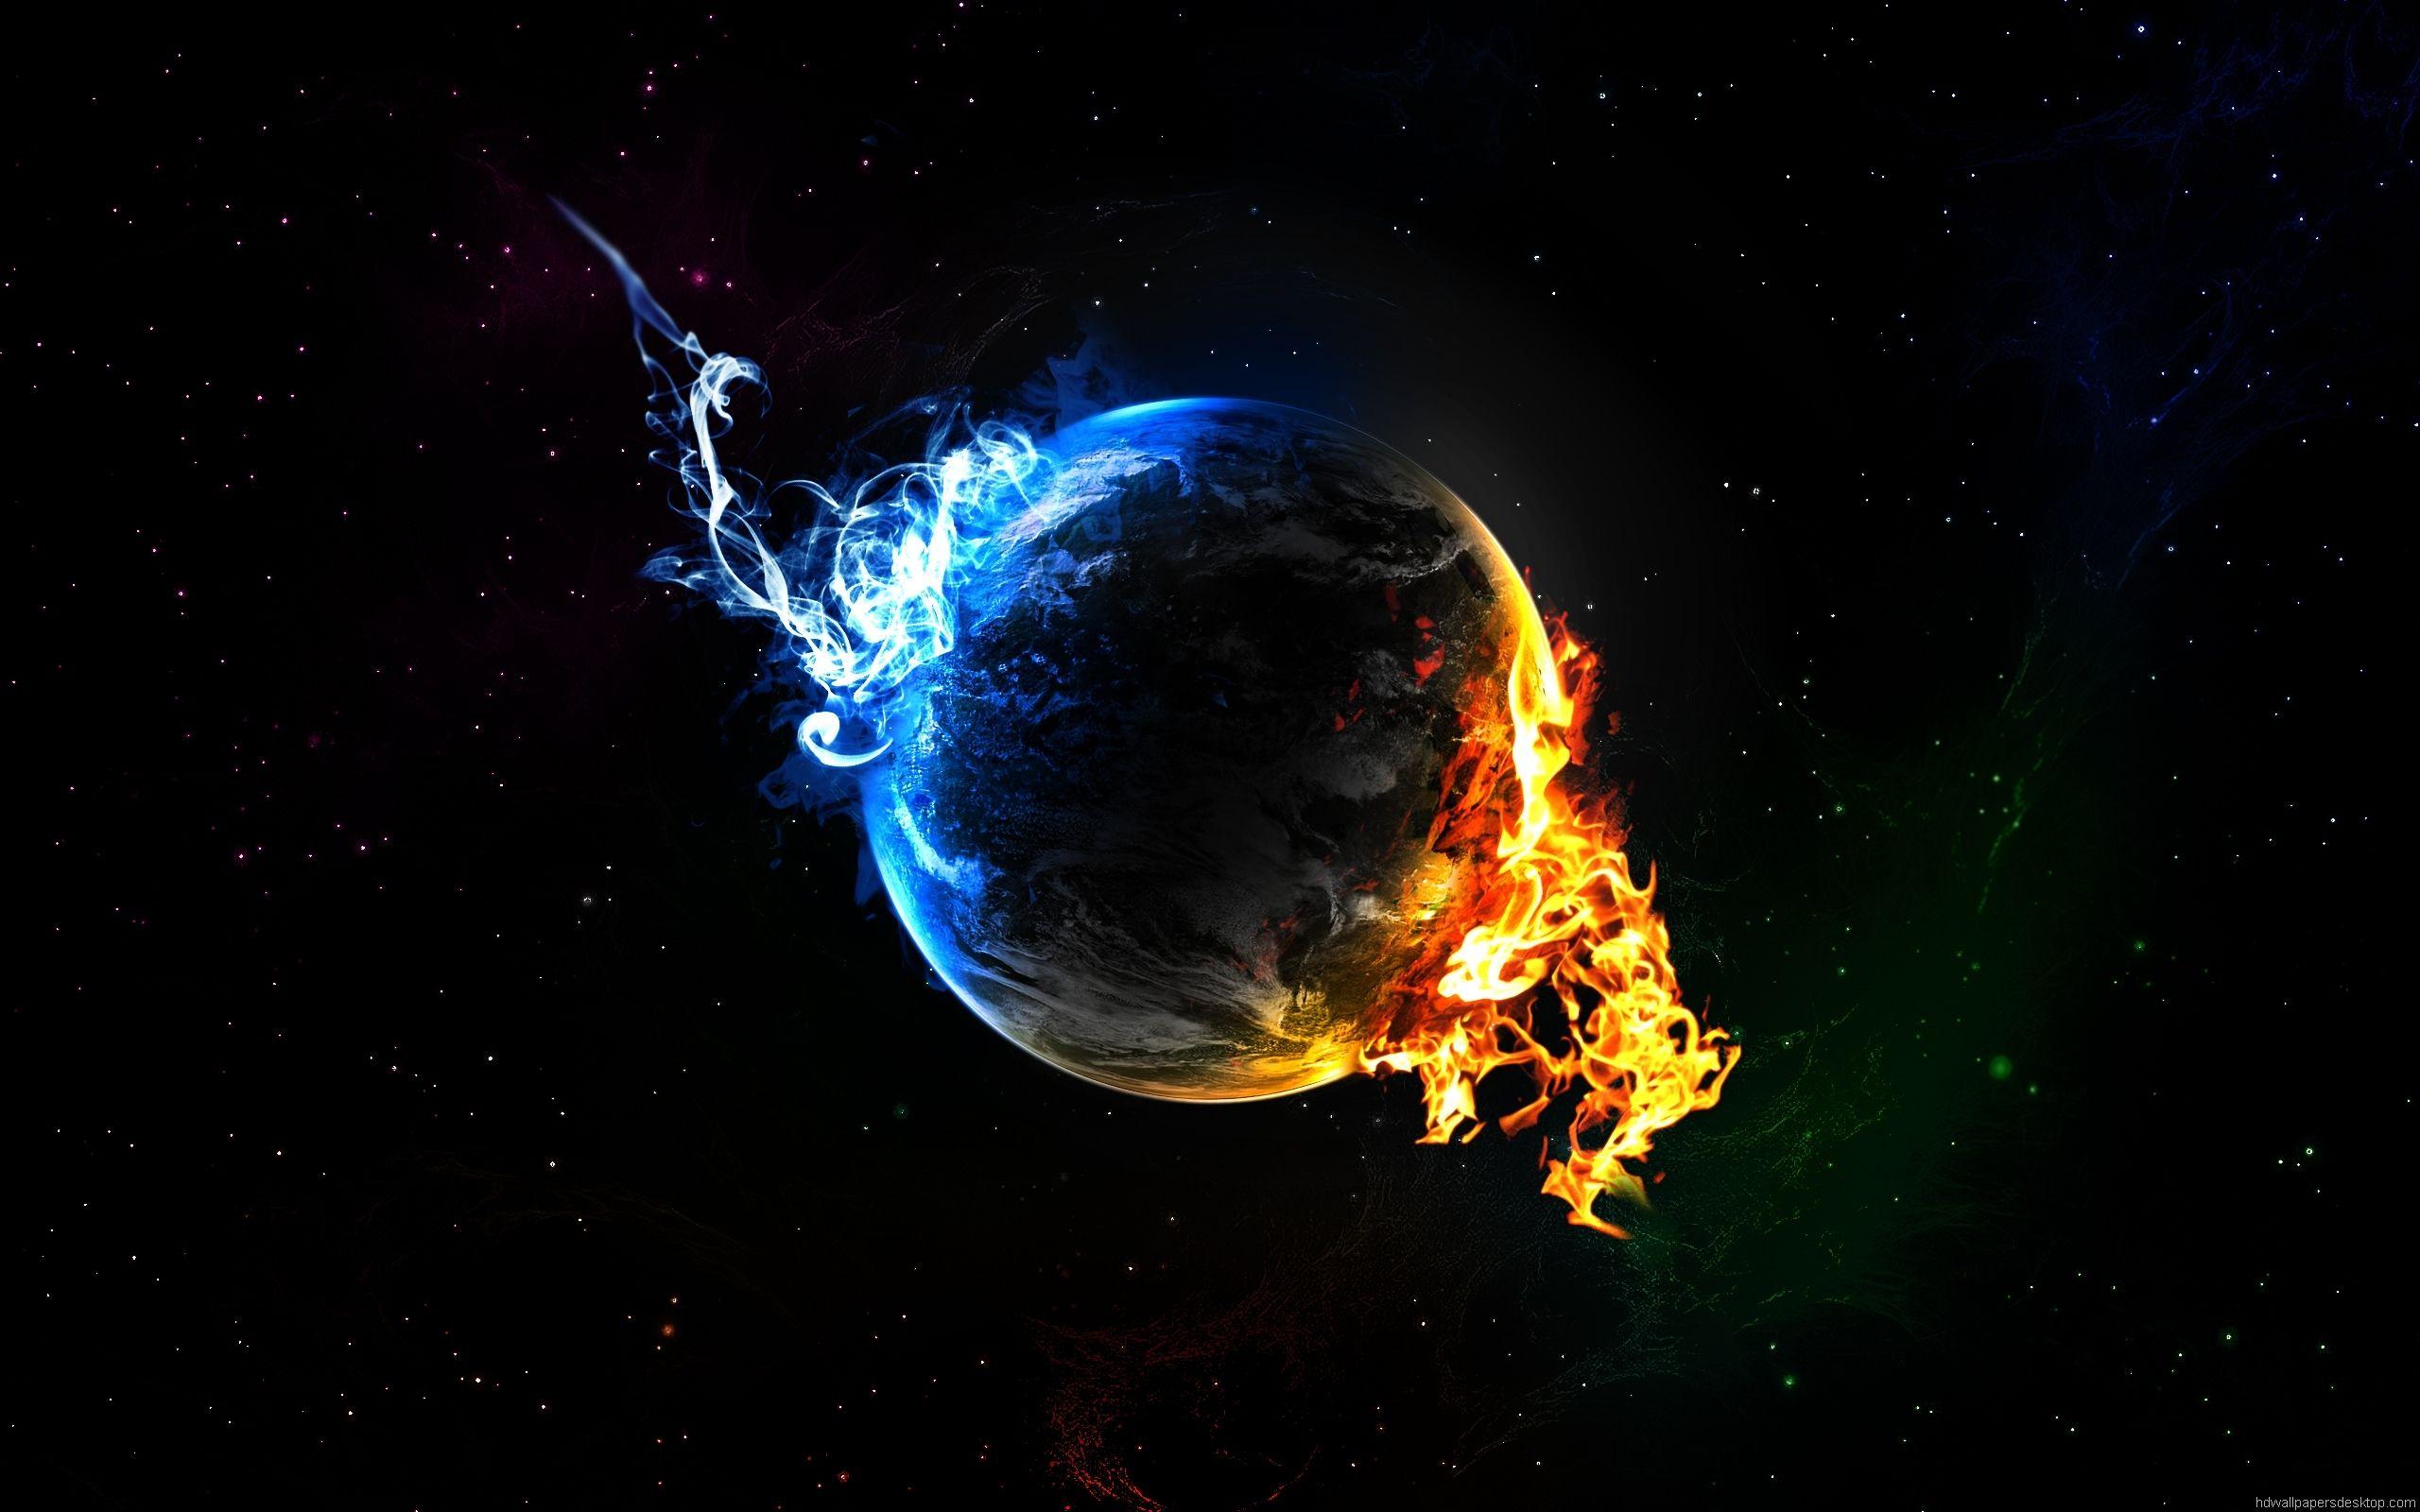 Digital Art Images Google Search Cool Desktop Wallpapers Wallpaper Earth Planets Wallpaper